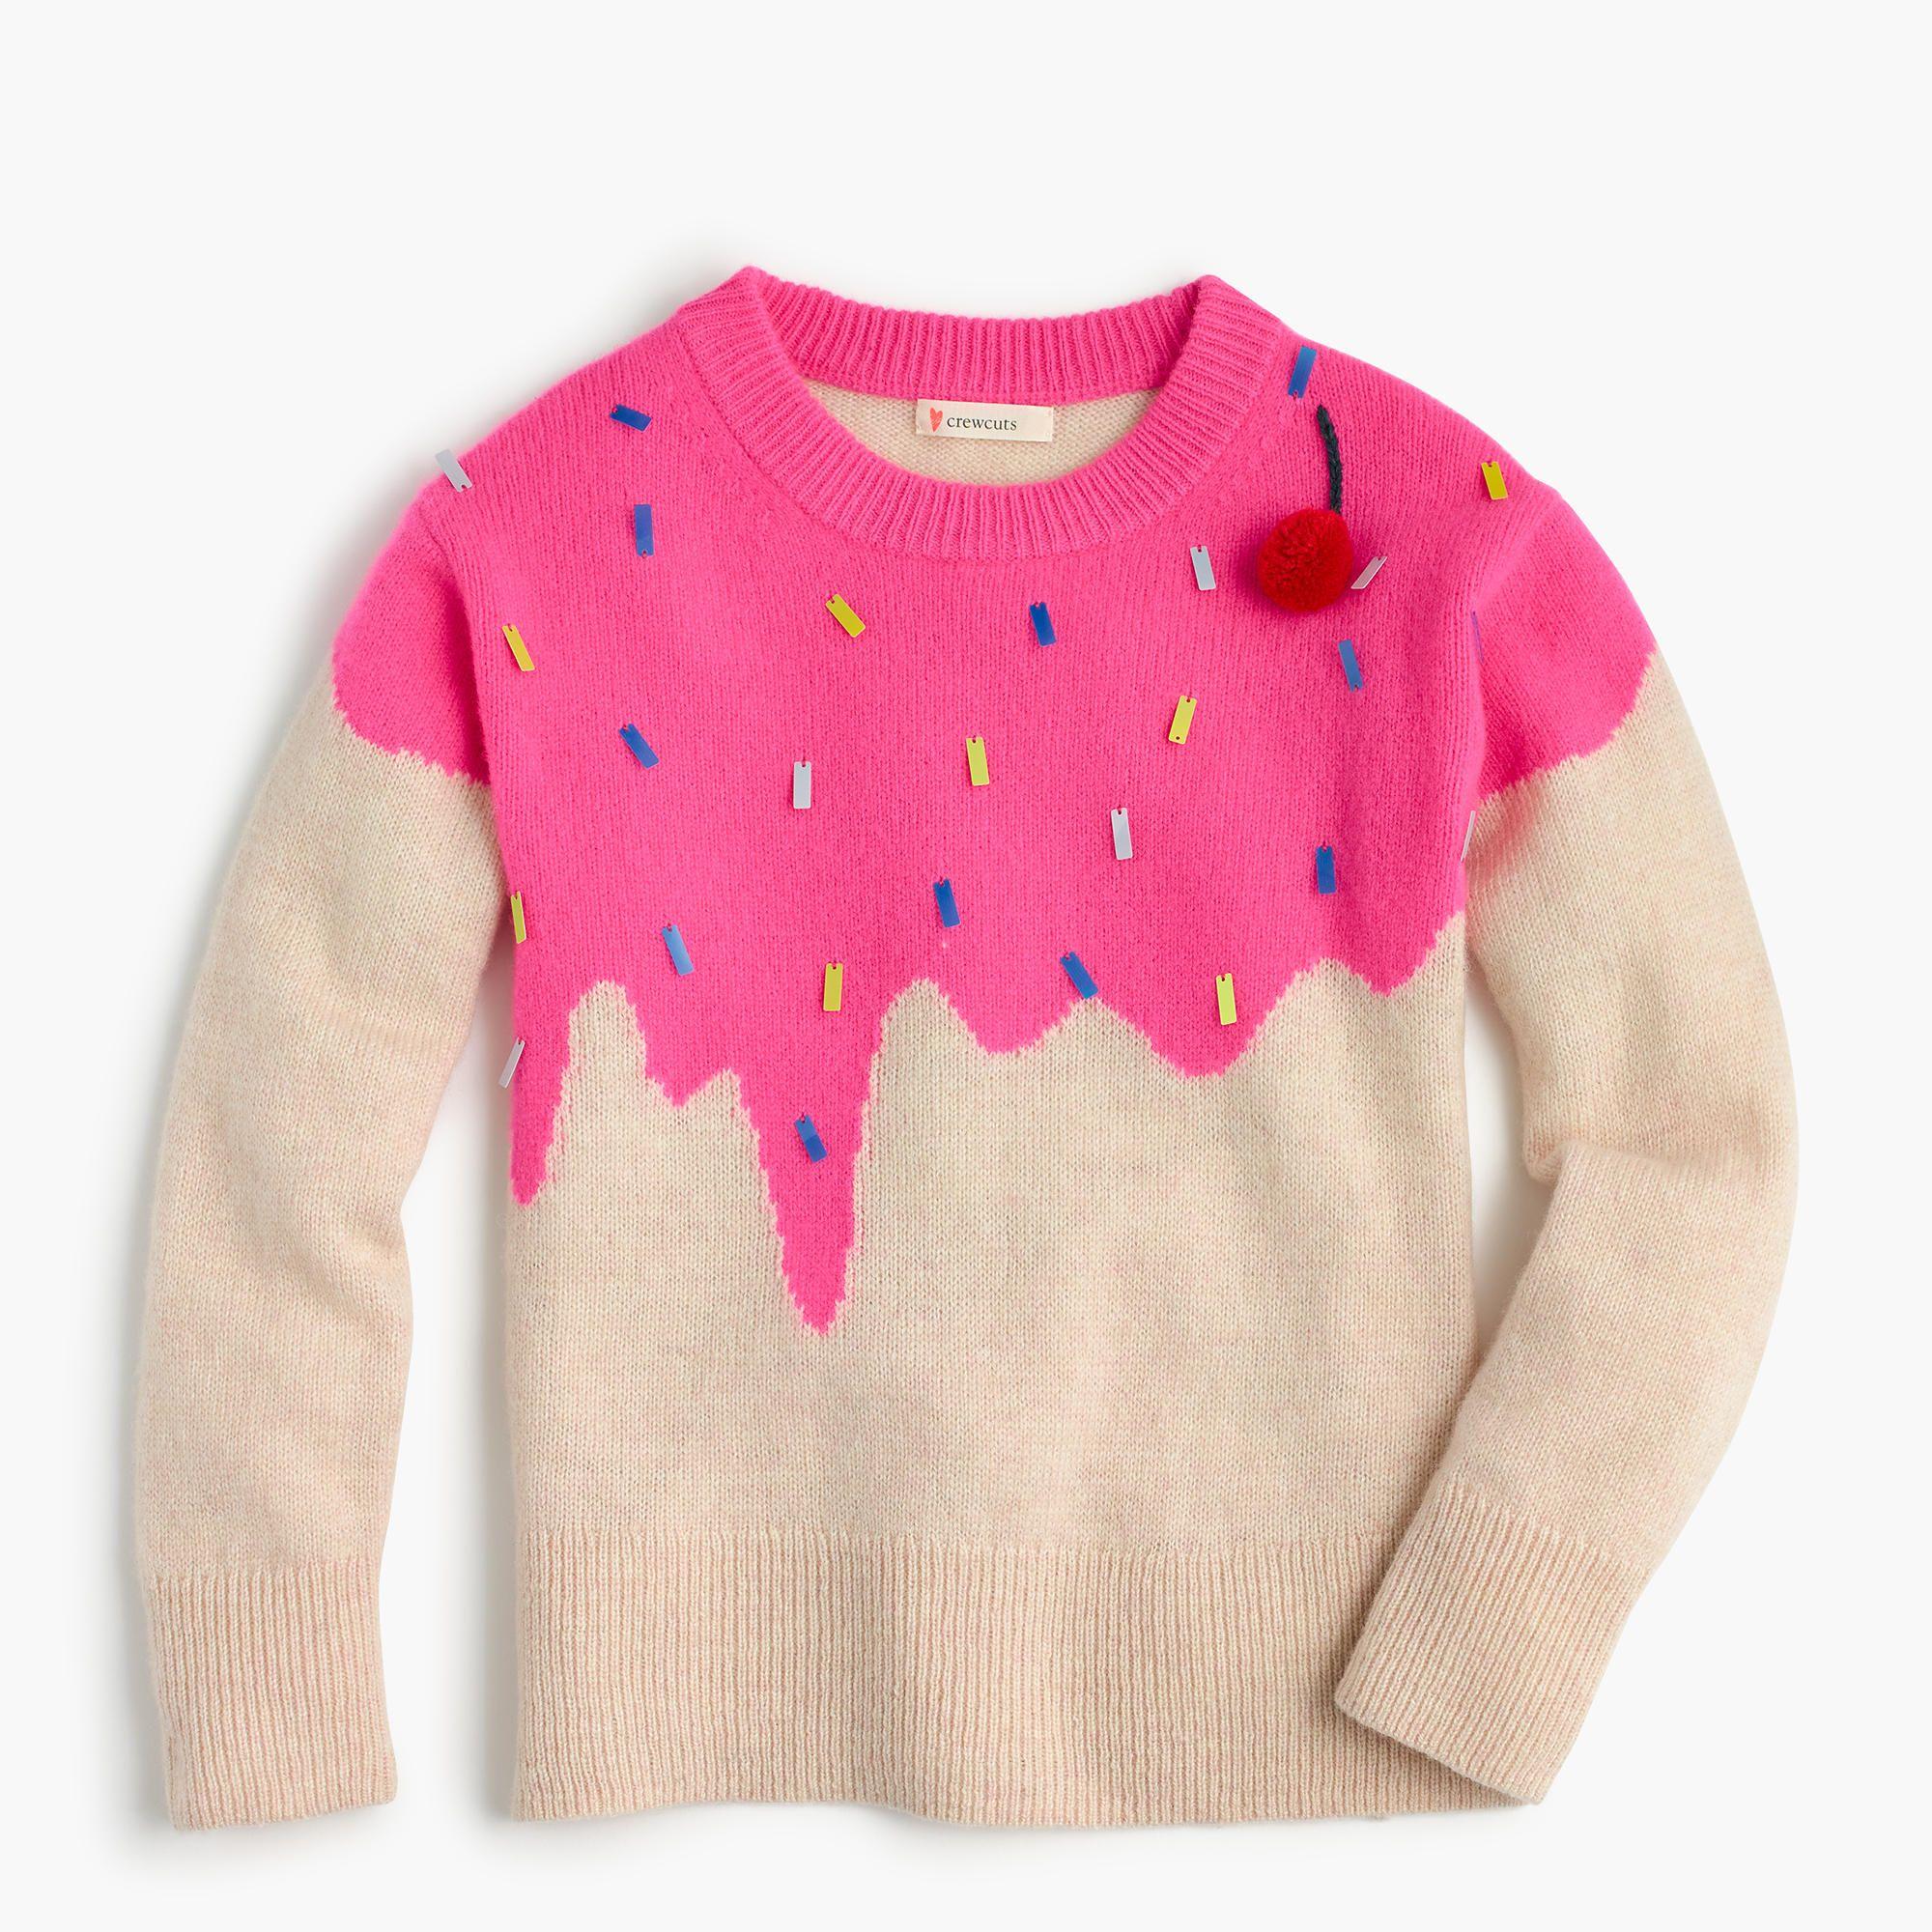 J.Crew Girls' ice cream popover sweater | Girls sweaters